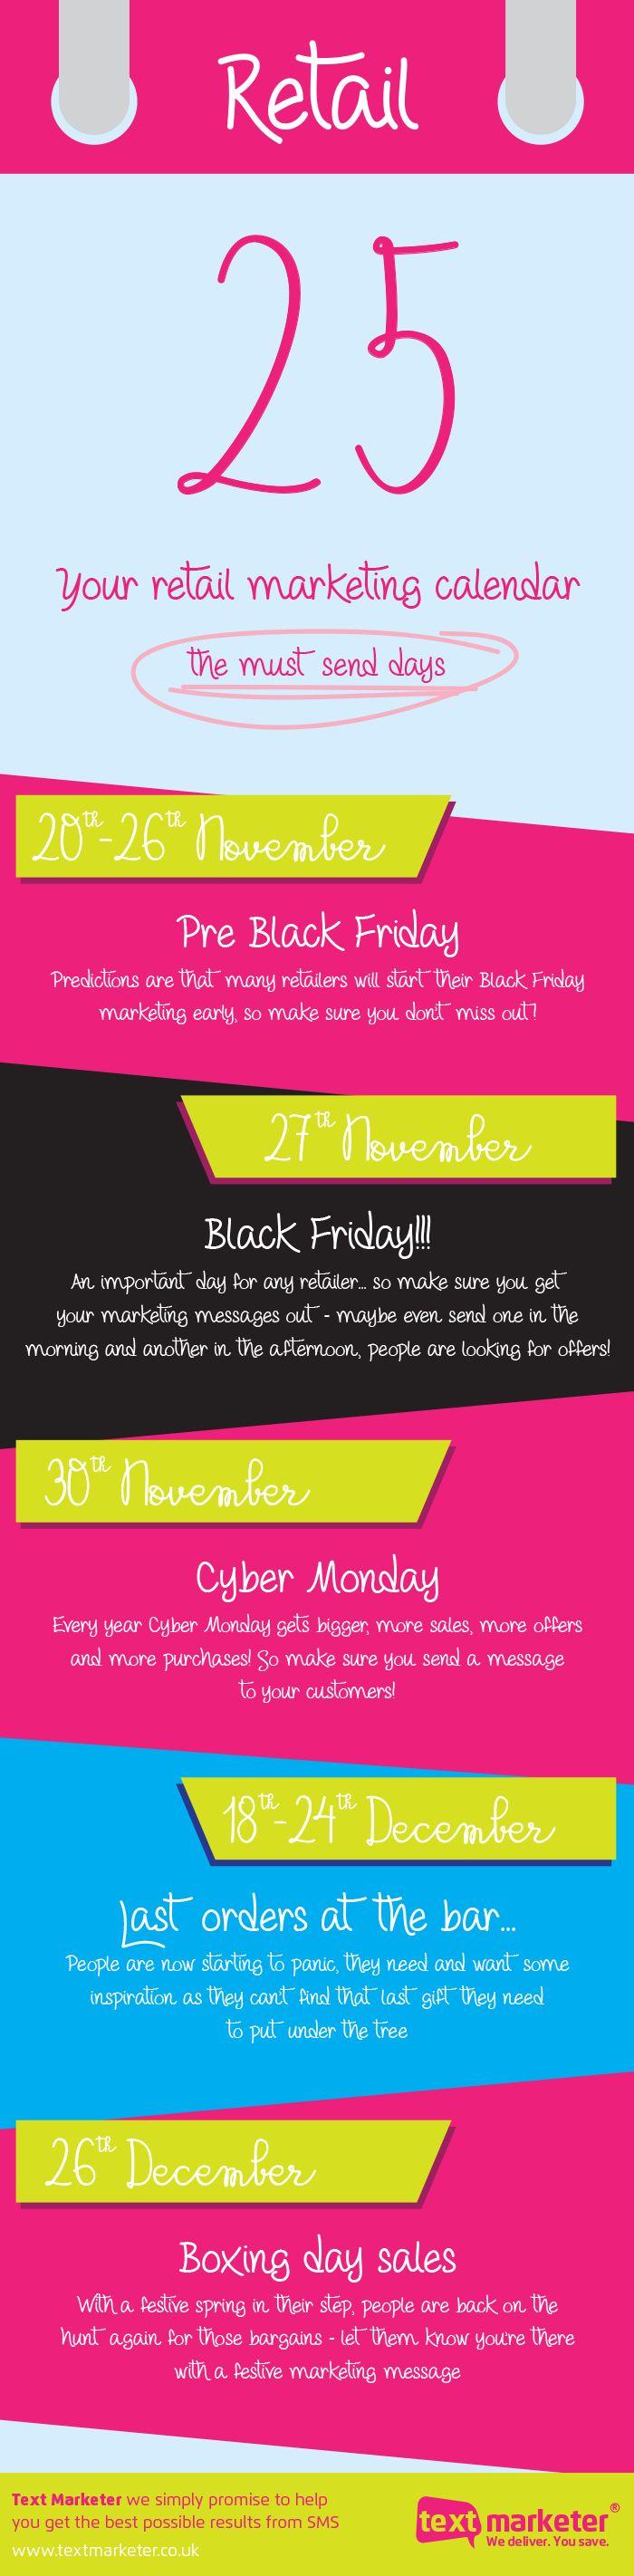 Your Retail Marketing Calendar #Infographic #Retail #Marketing